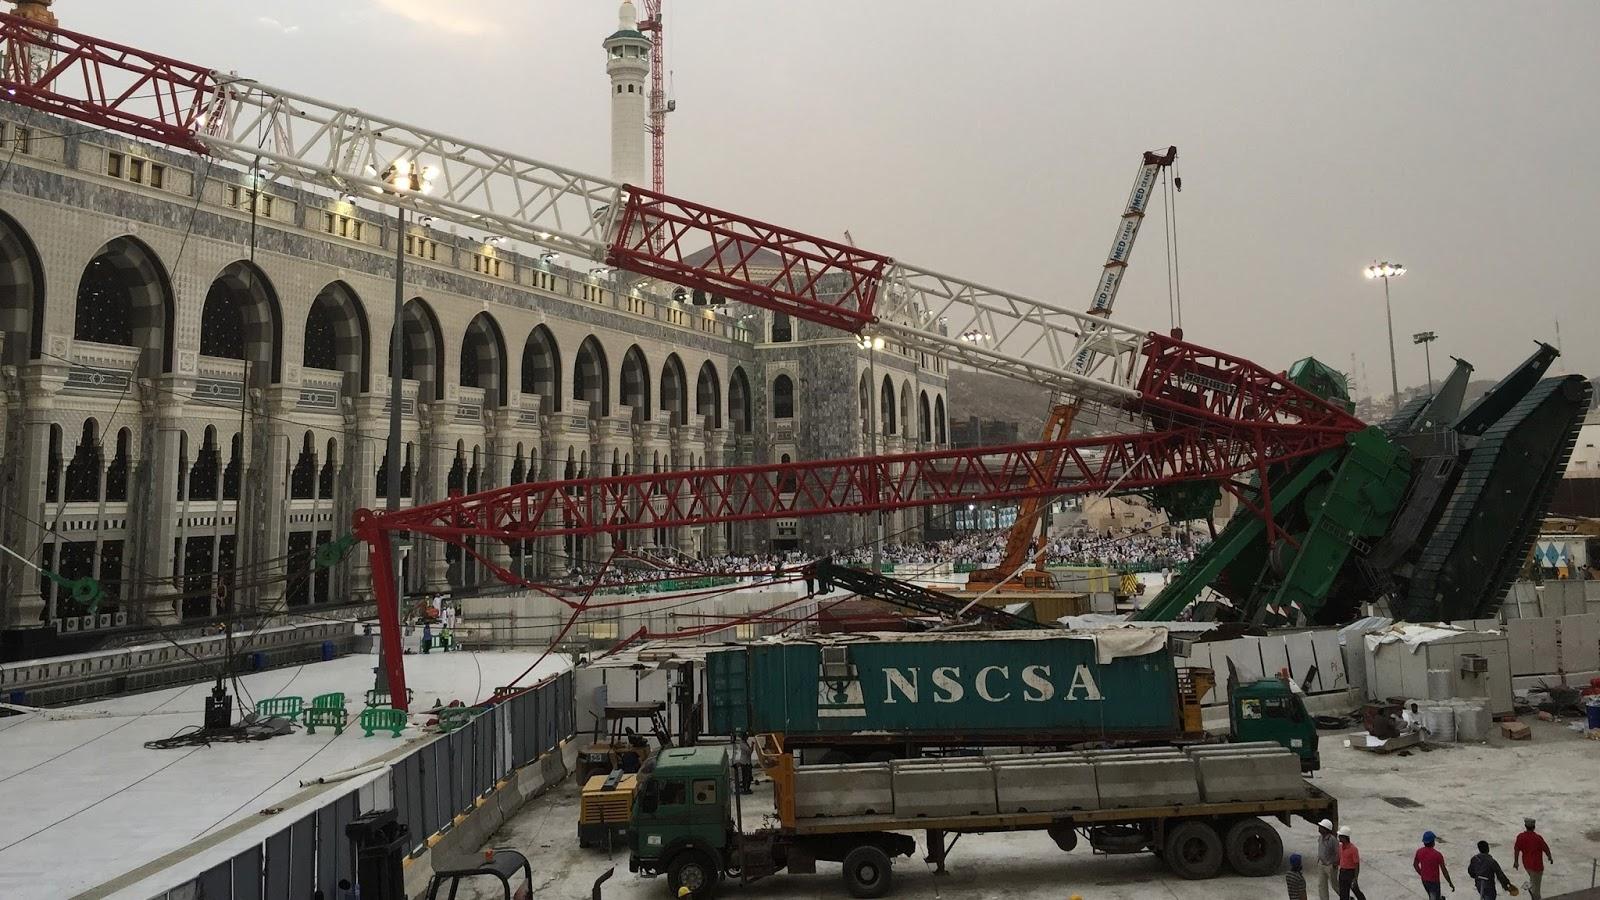 crawler crane falling backwards into the mecca mosque